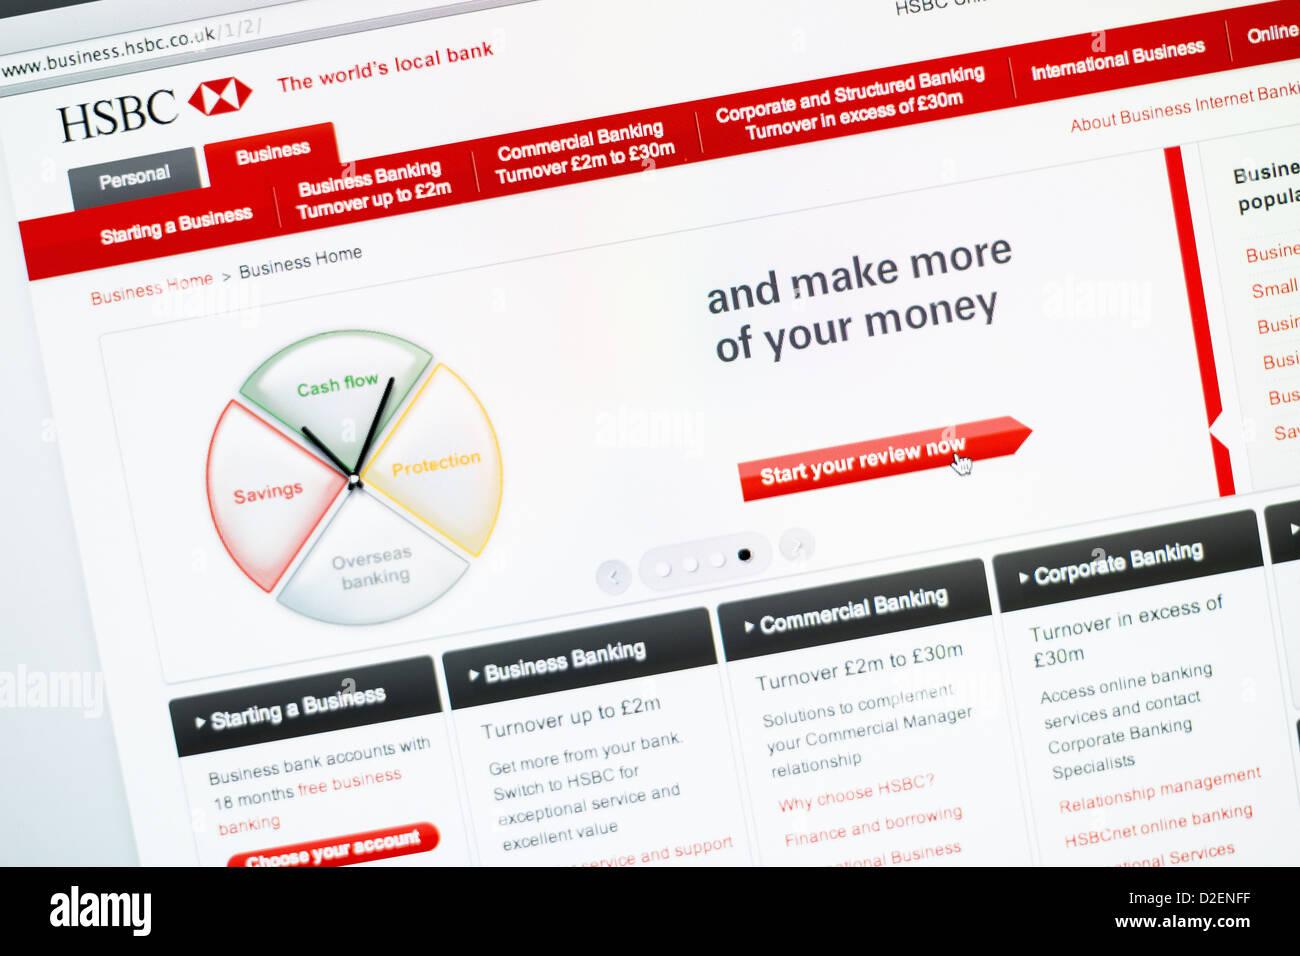 HSBC Business Banking website Stock Photo: 53184643 - Alamy